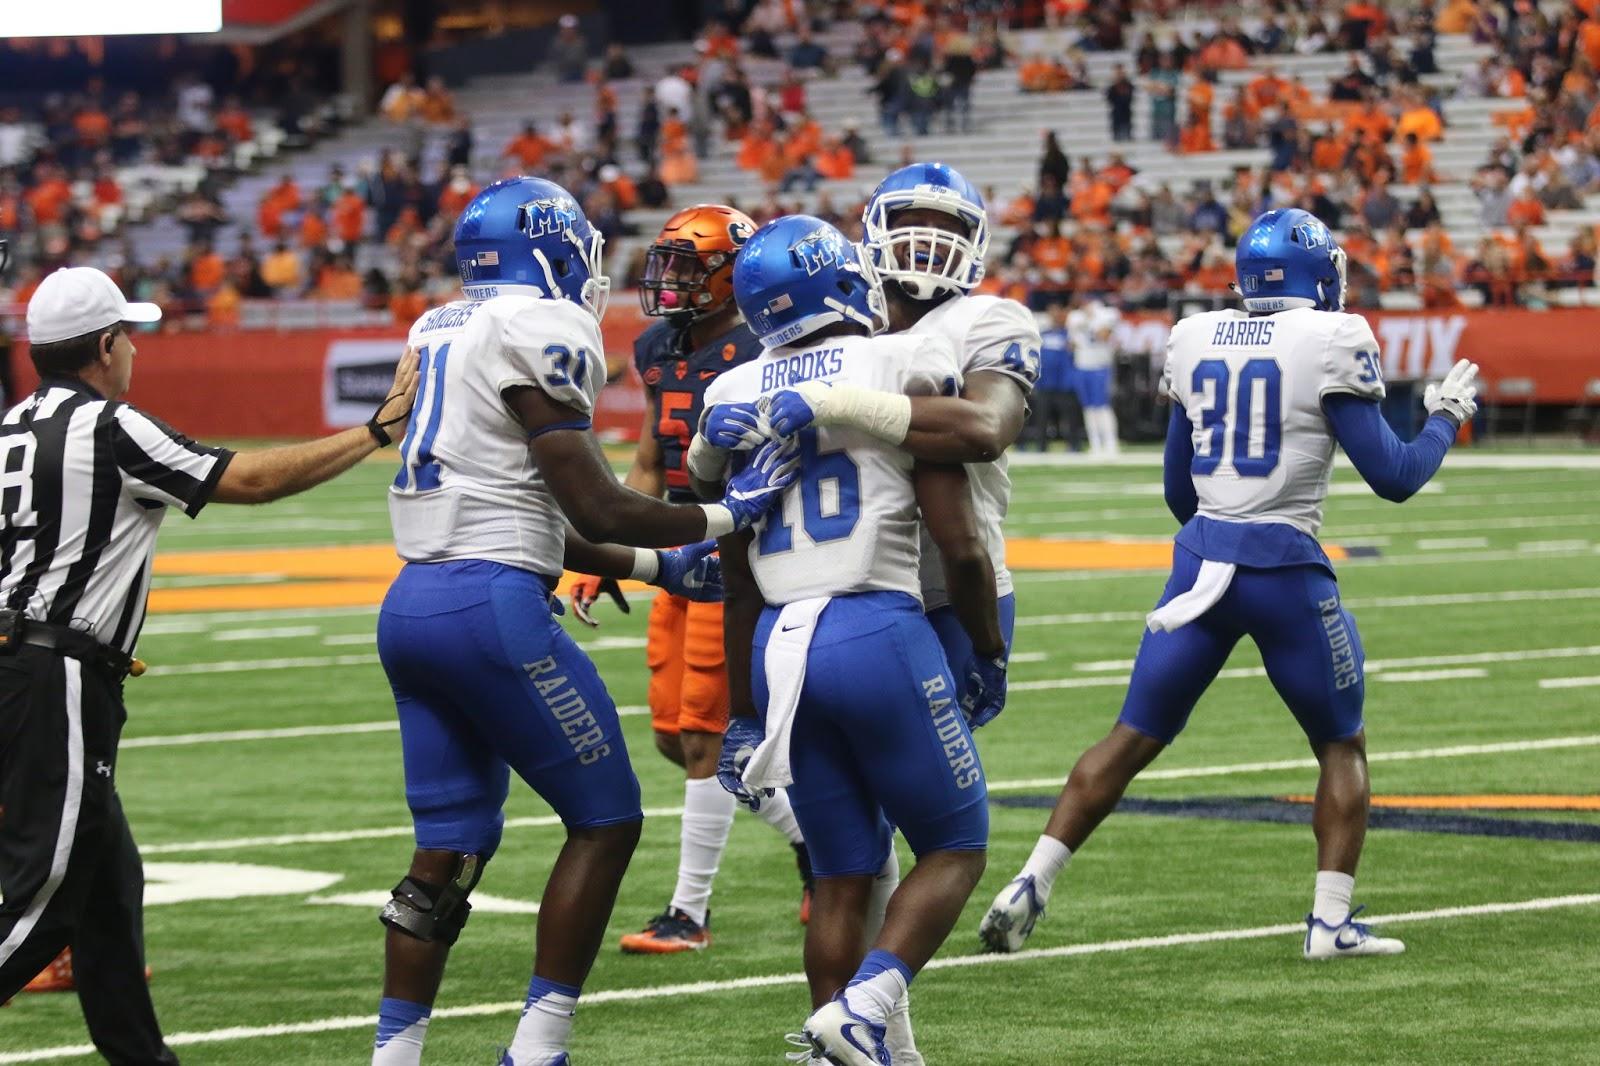 Blue Raiders Down Orange in Shafer Return